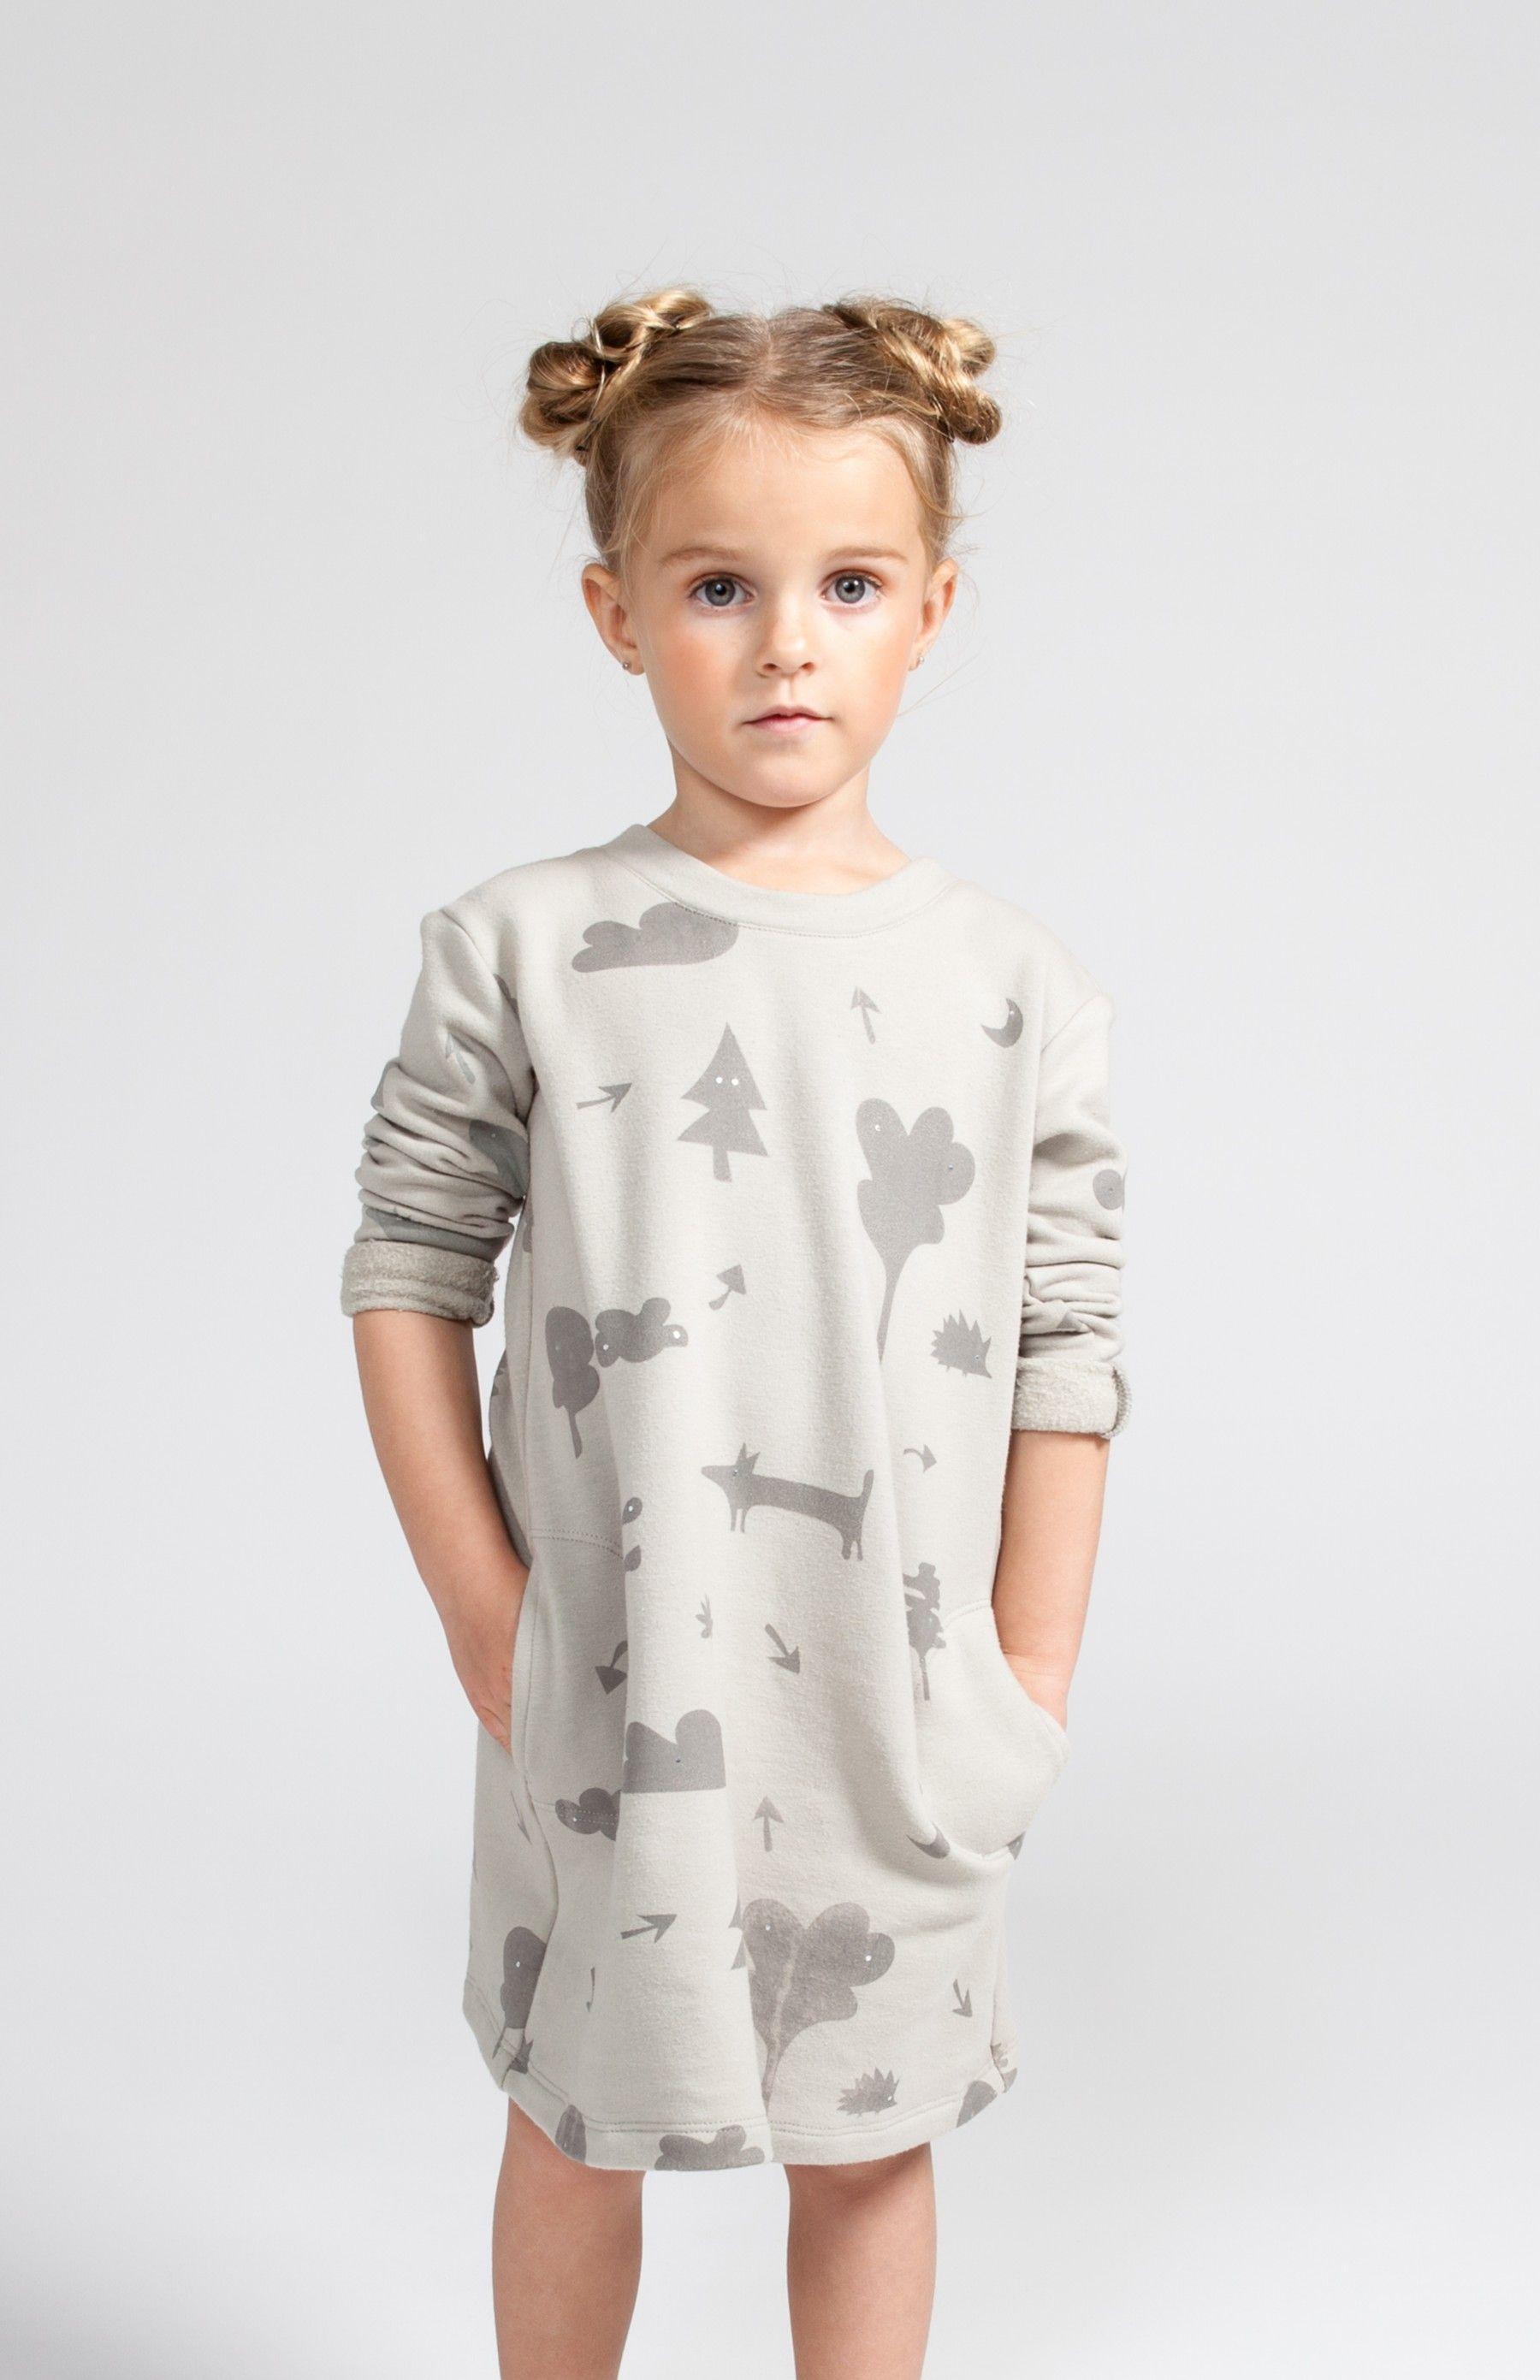 Whoa Dude! Omamimini Secret Forest Sweatshirt Dress | KIDS CLOTHES ...